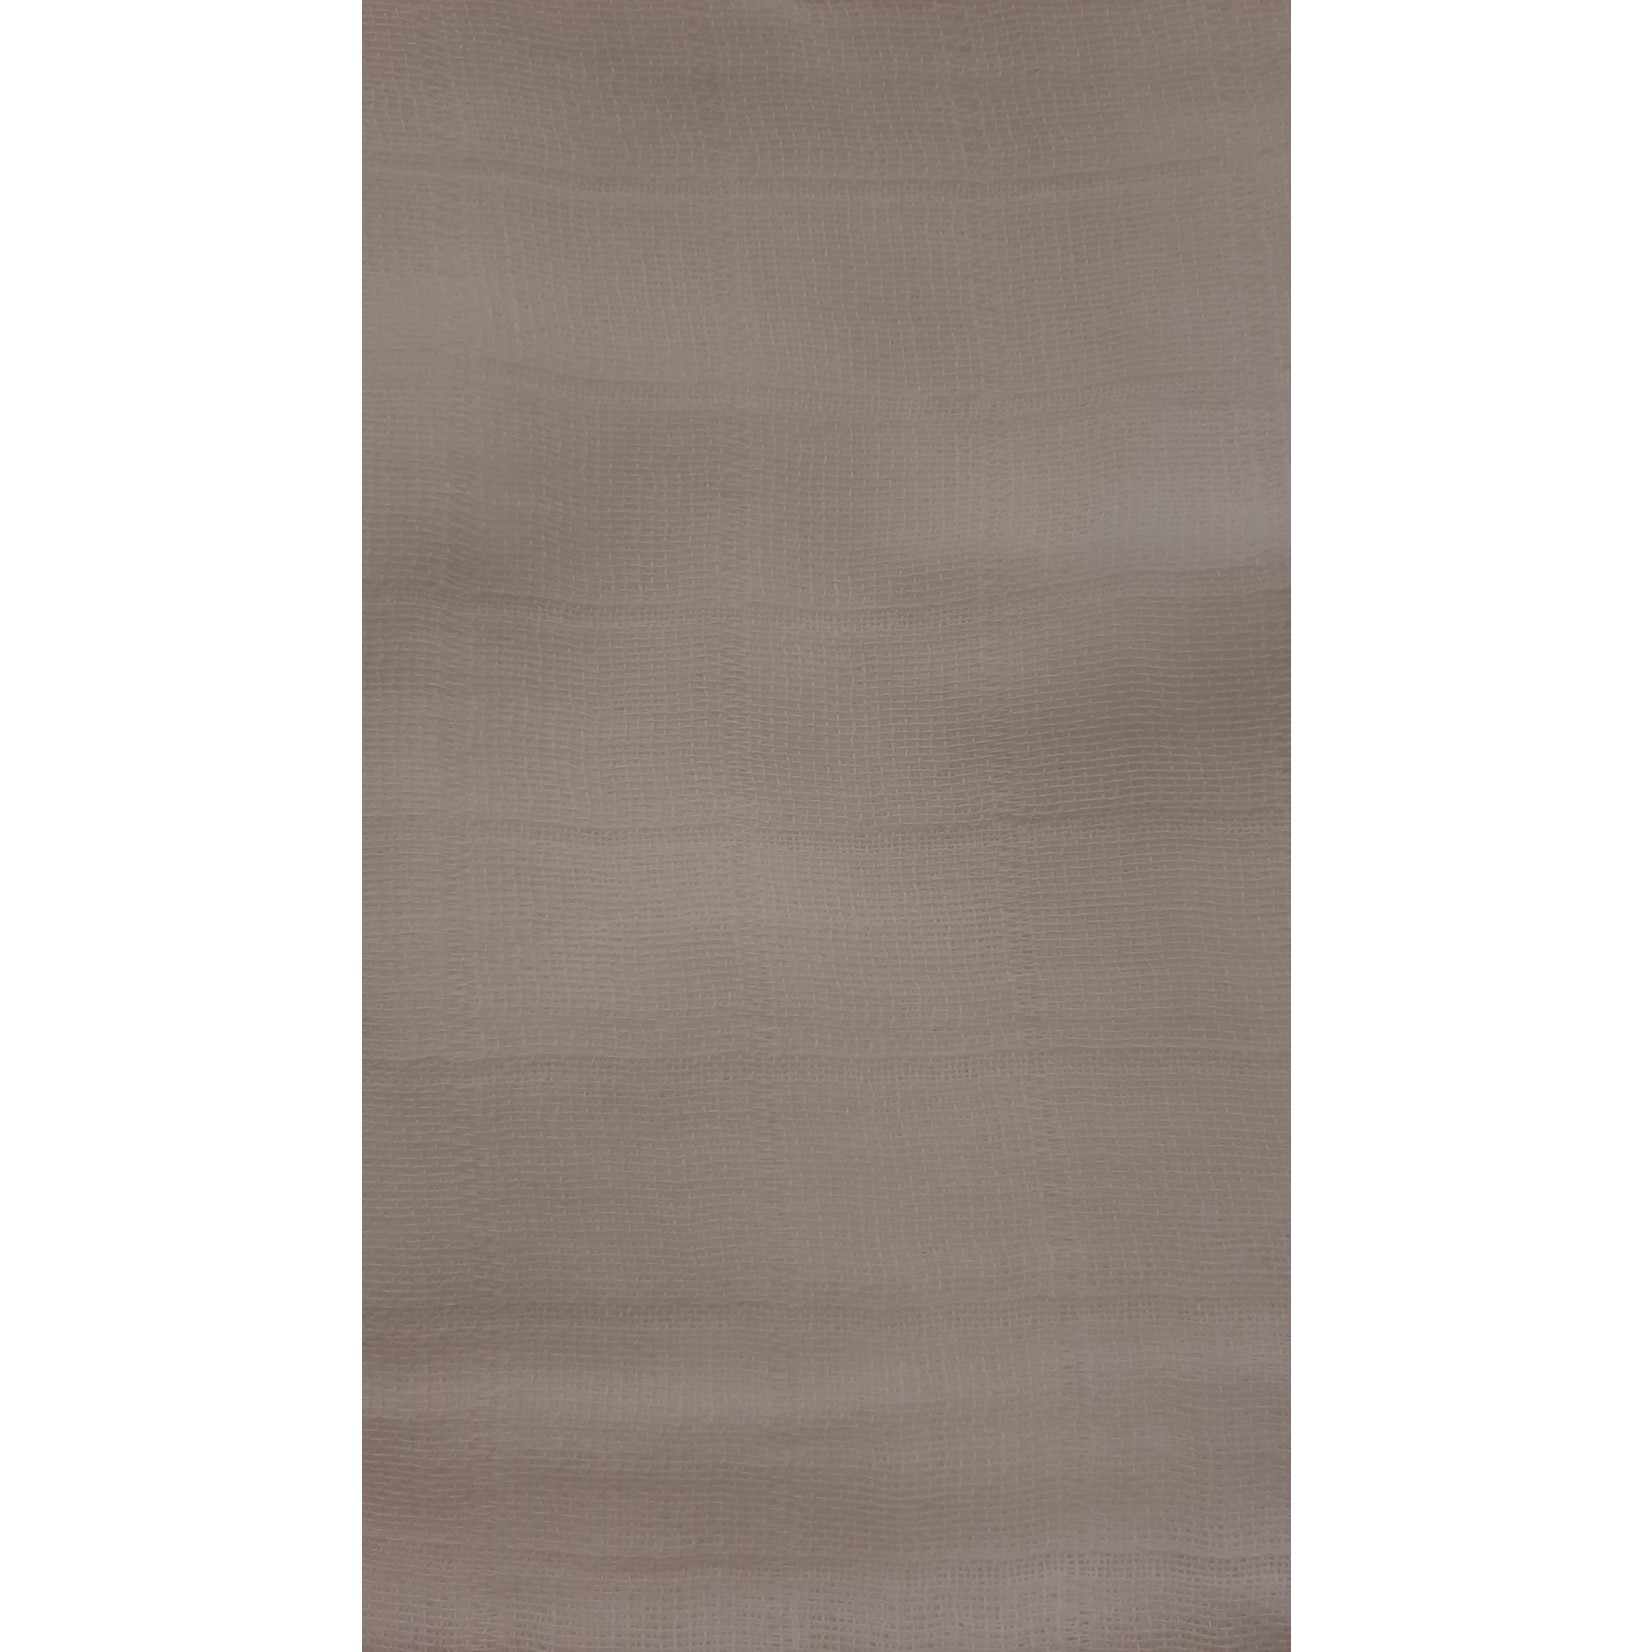 Hydrofiel doek 70x70